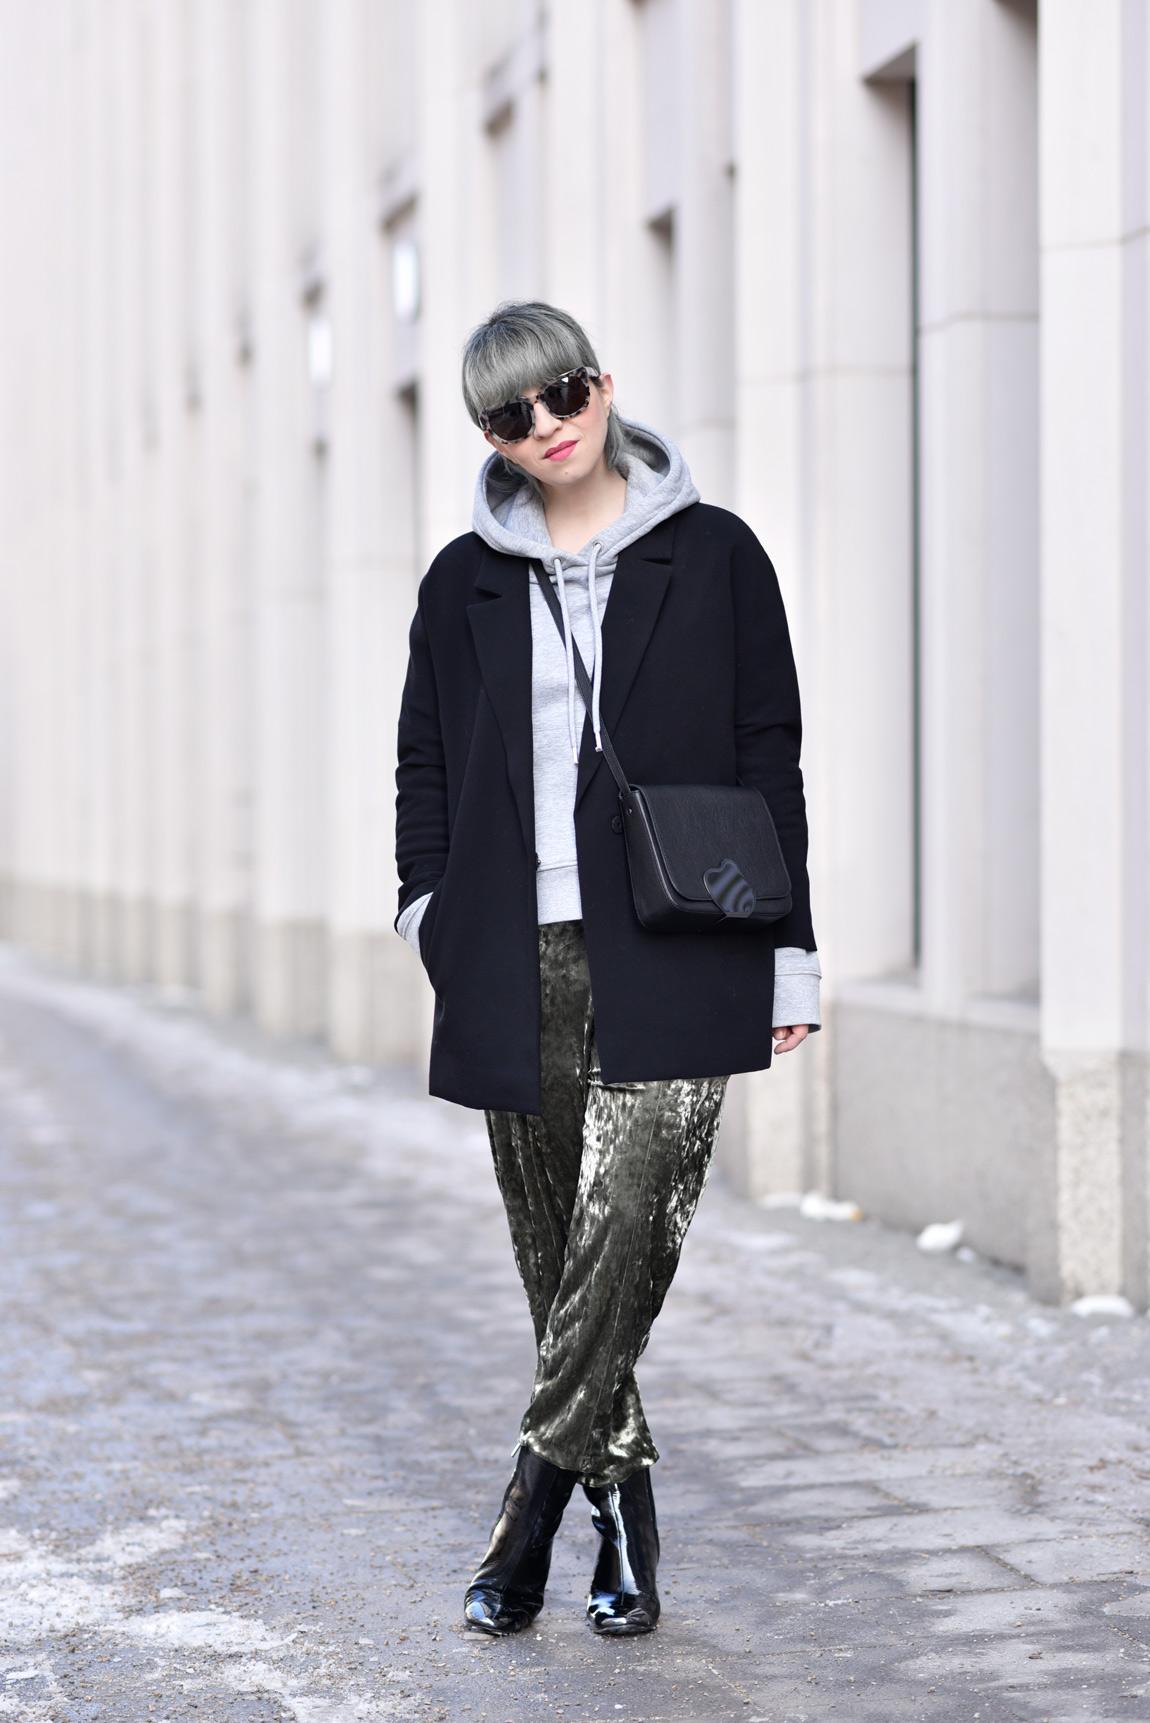 blogger, test, trend, samt, hose, outfit, inspiration, fashionblog, modeblog, muenchen, streetstyle